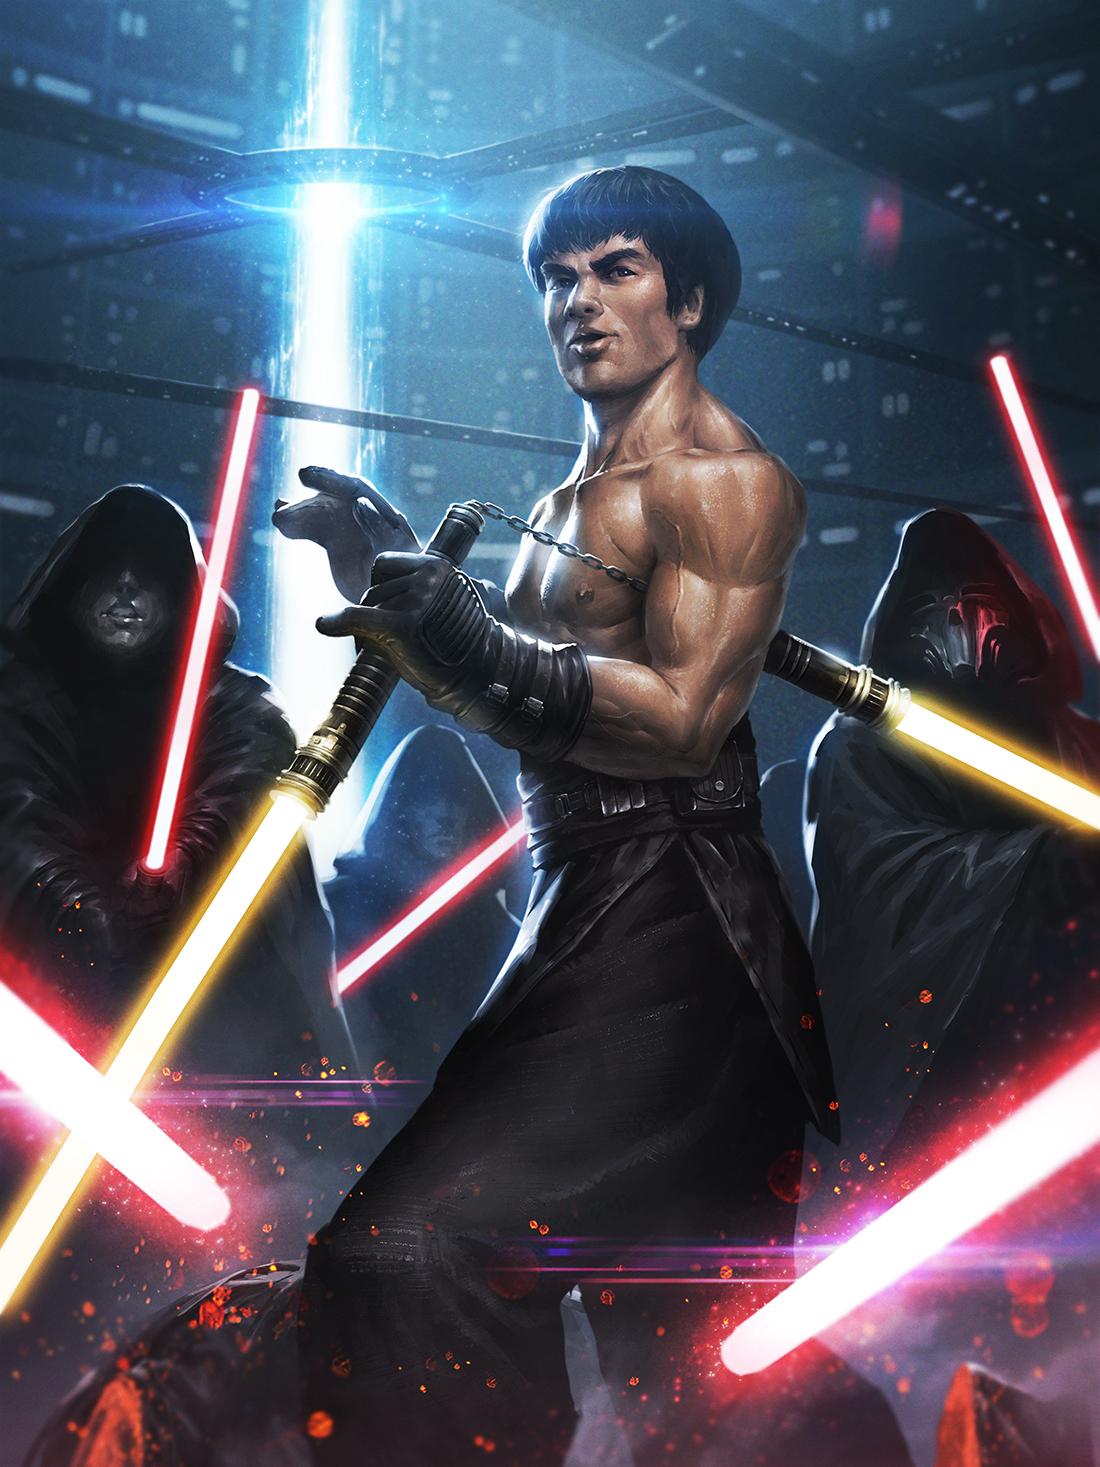 Star Wars 7 - Page 7 Bruce_lee_jedi_by_ameeeeba-d9n1upv